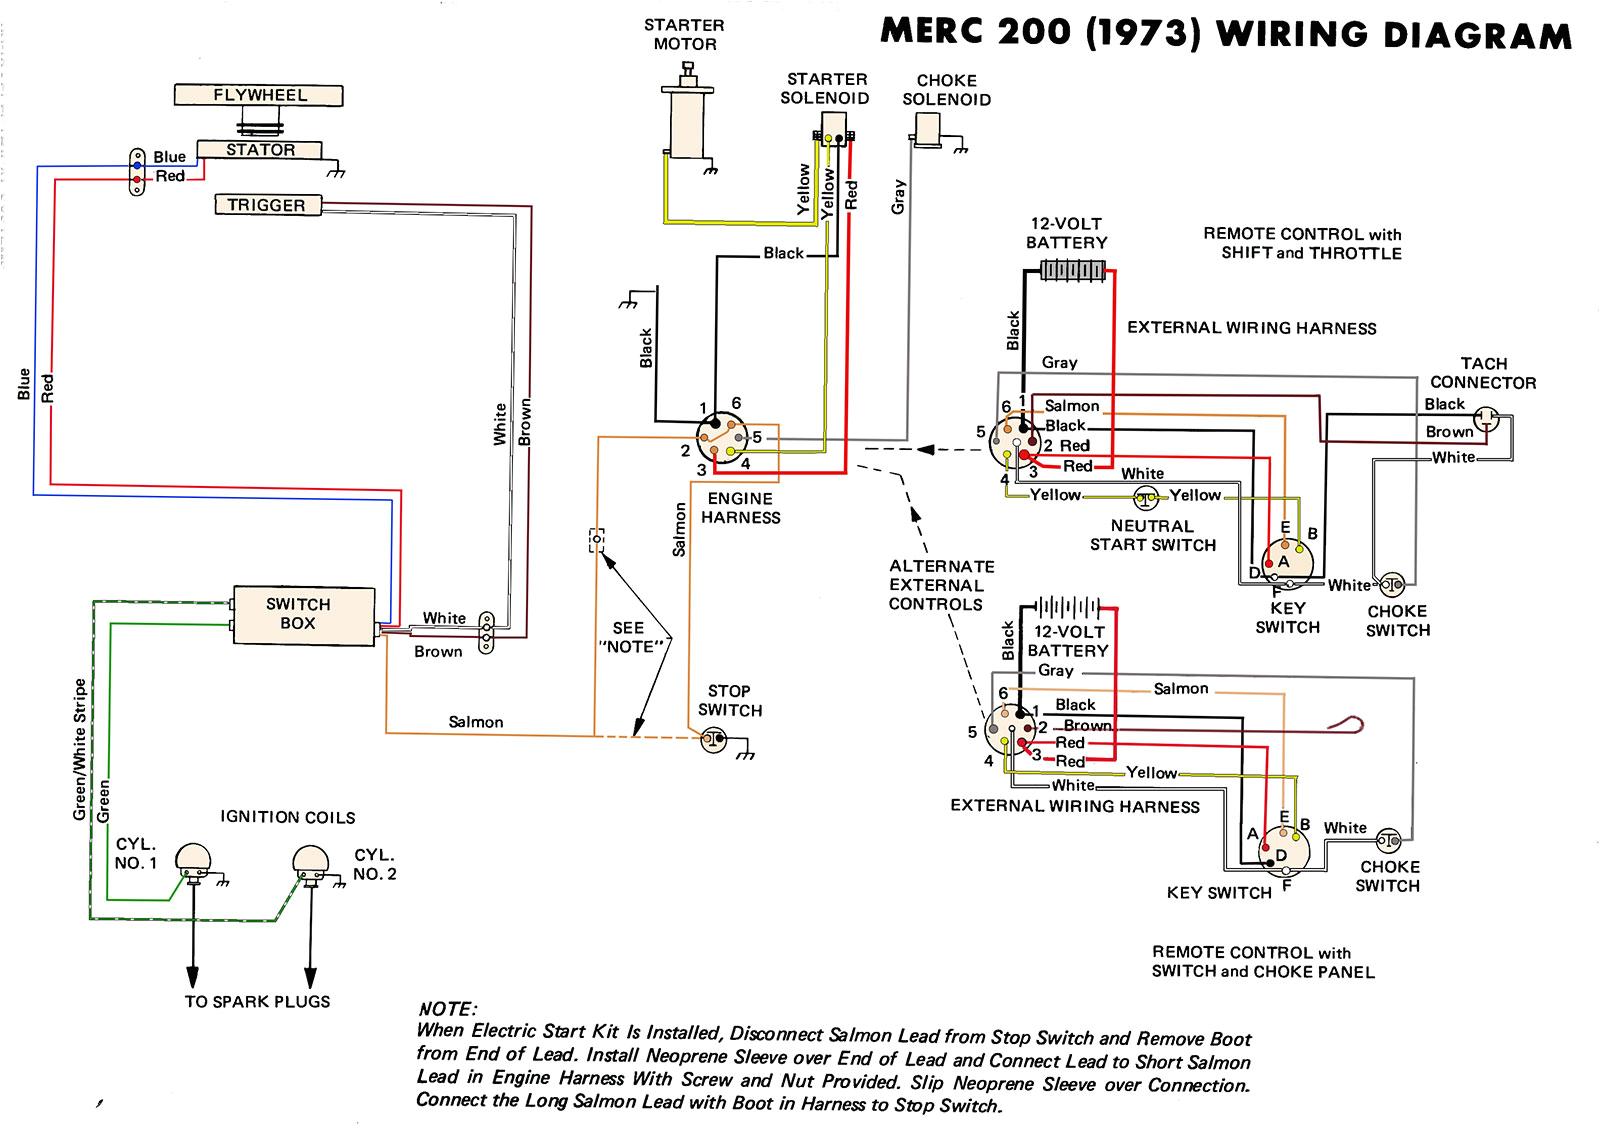 1994 mercury 40 wiring diagram wiring diagrams bib 1994 mercury 40 wiring diagram